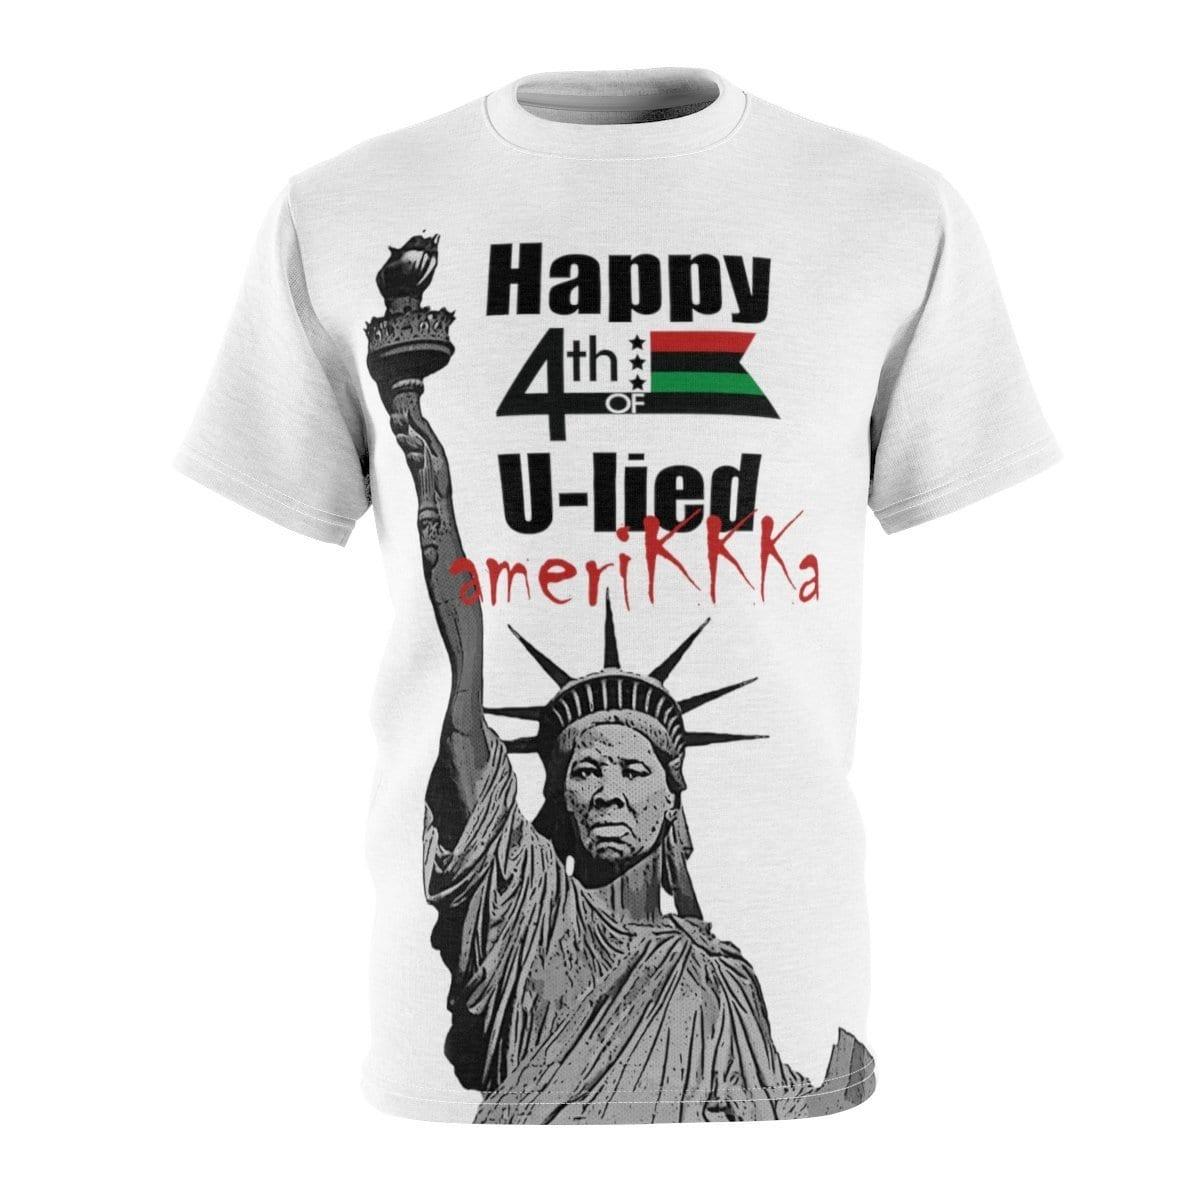 Harriet Tubman Statue Of Liberty Happy 4th Of U-Lied AmericKKKa - Melanin Apparel